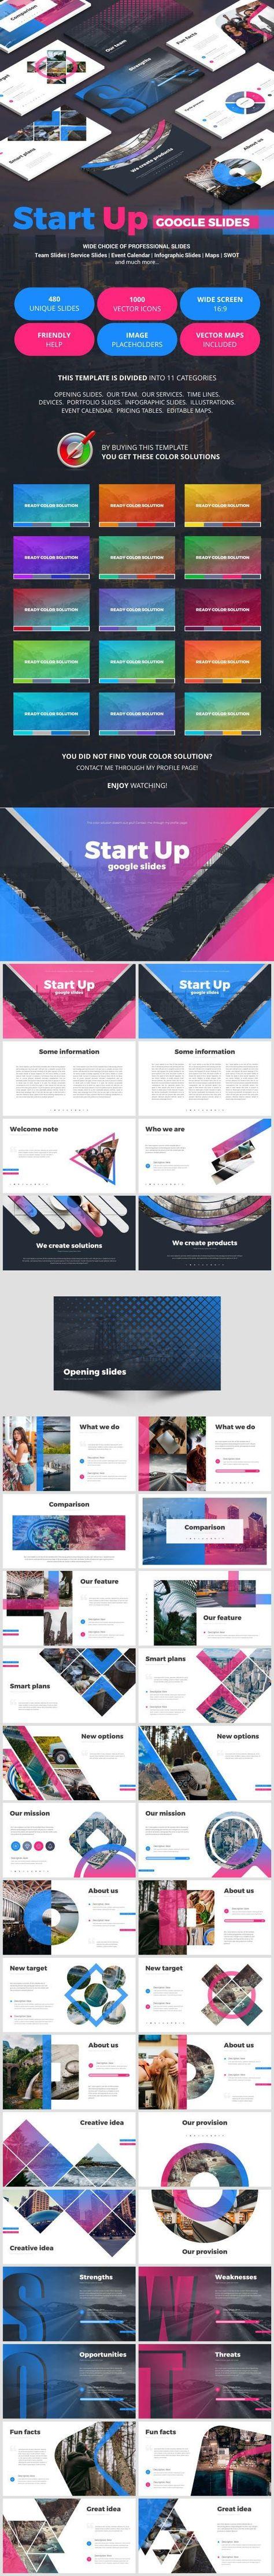 StartUp Google Slides